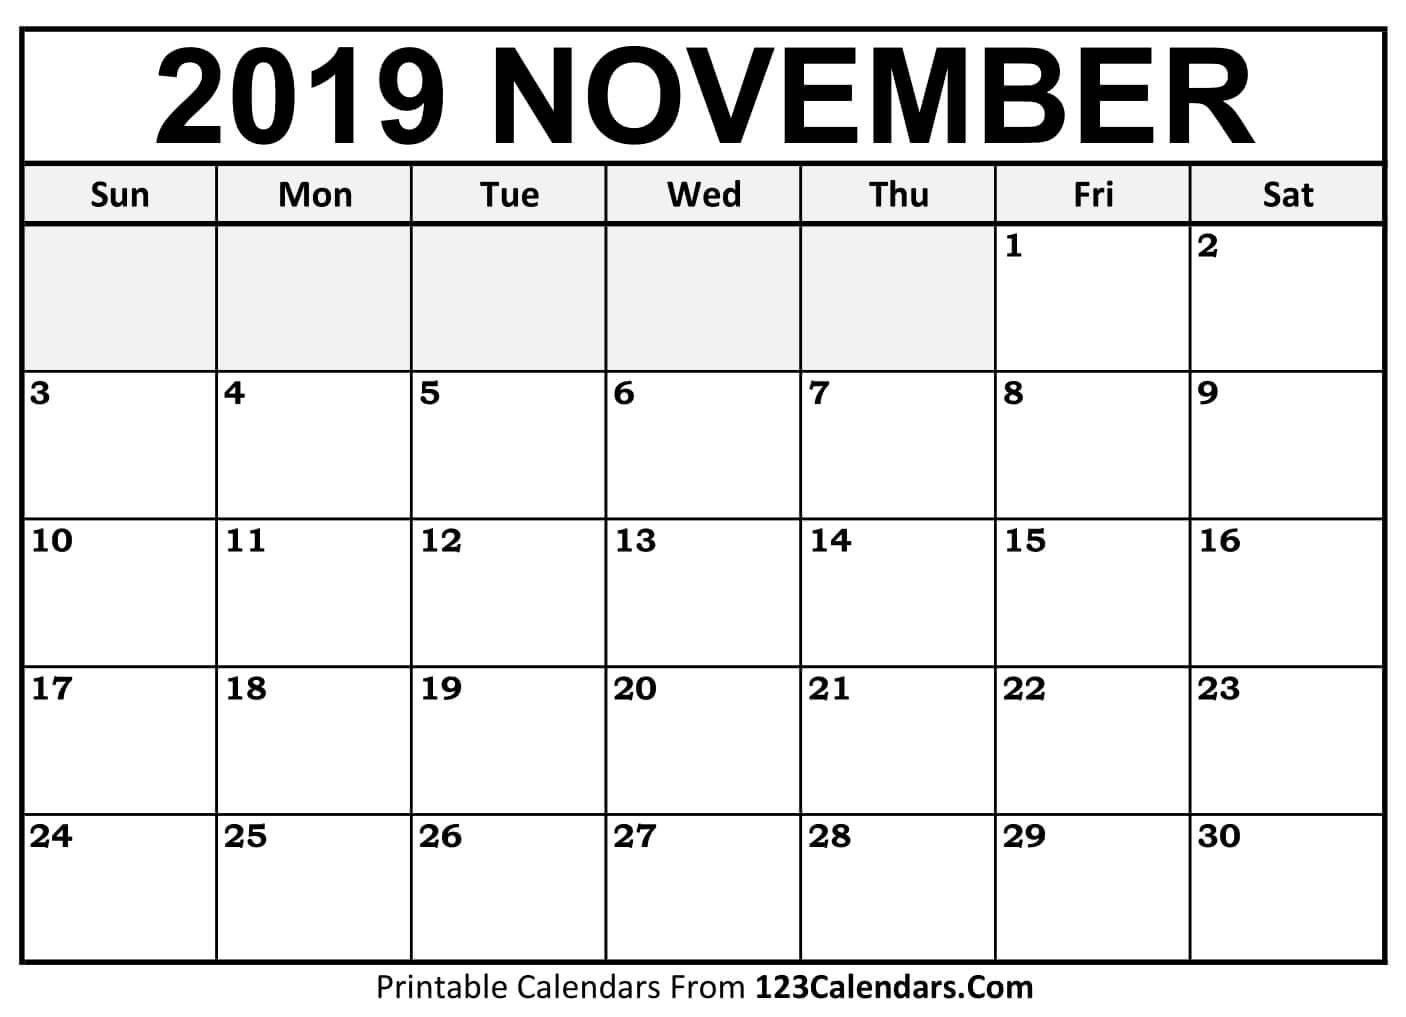 Printable November 2019 Calendar Templates - 123Calendars Calendar Of 2019 November